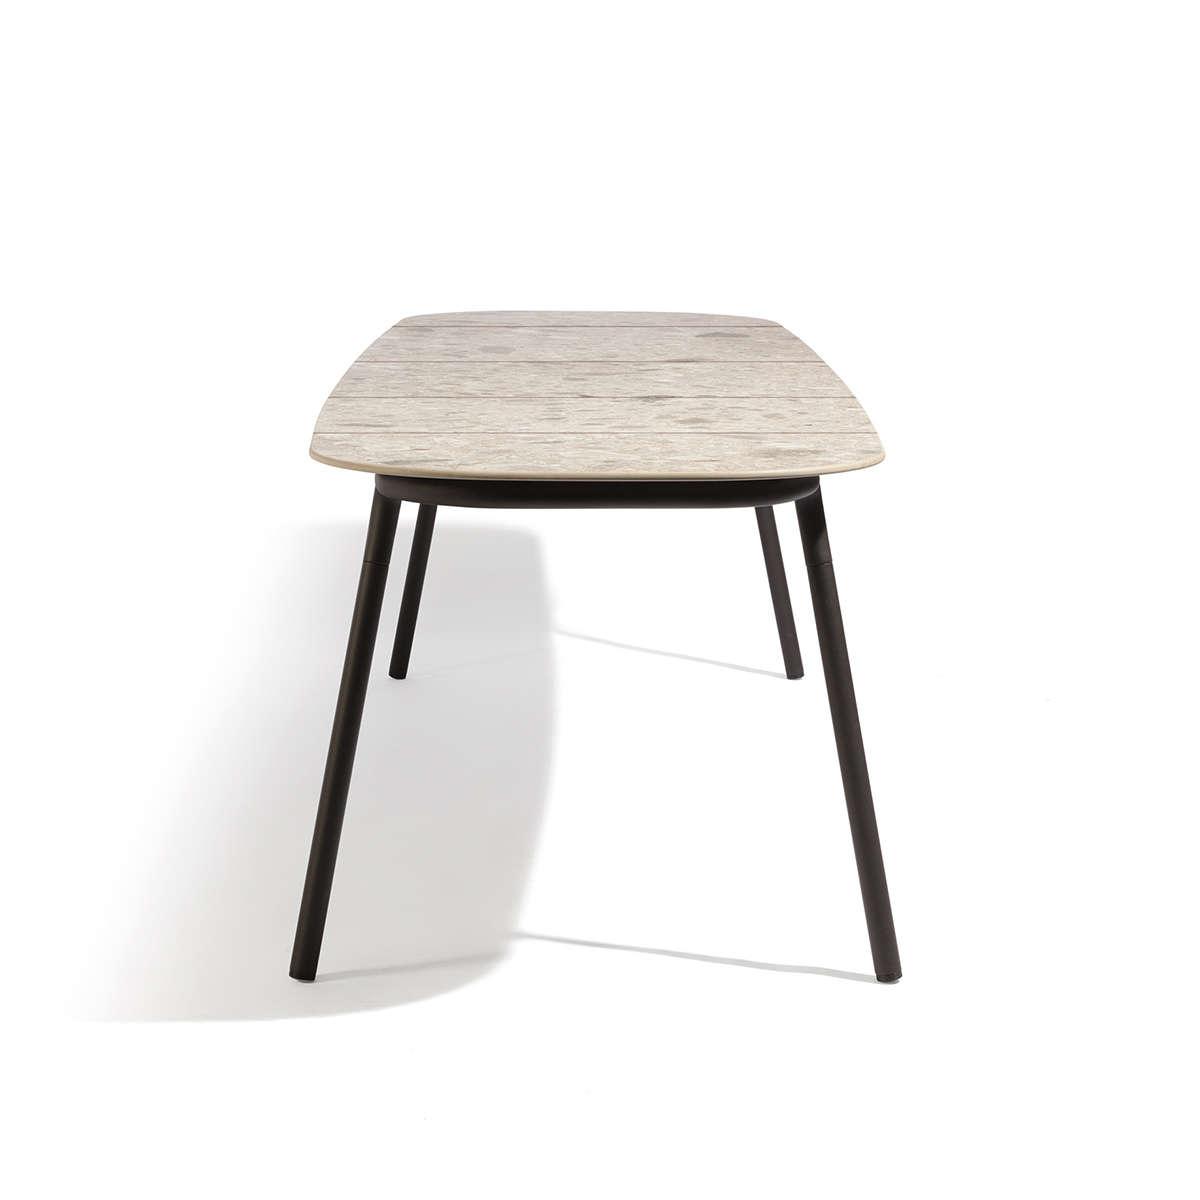 Manutti Torsa Dining Table Cut Out 4